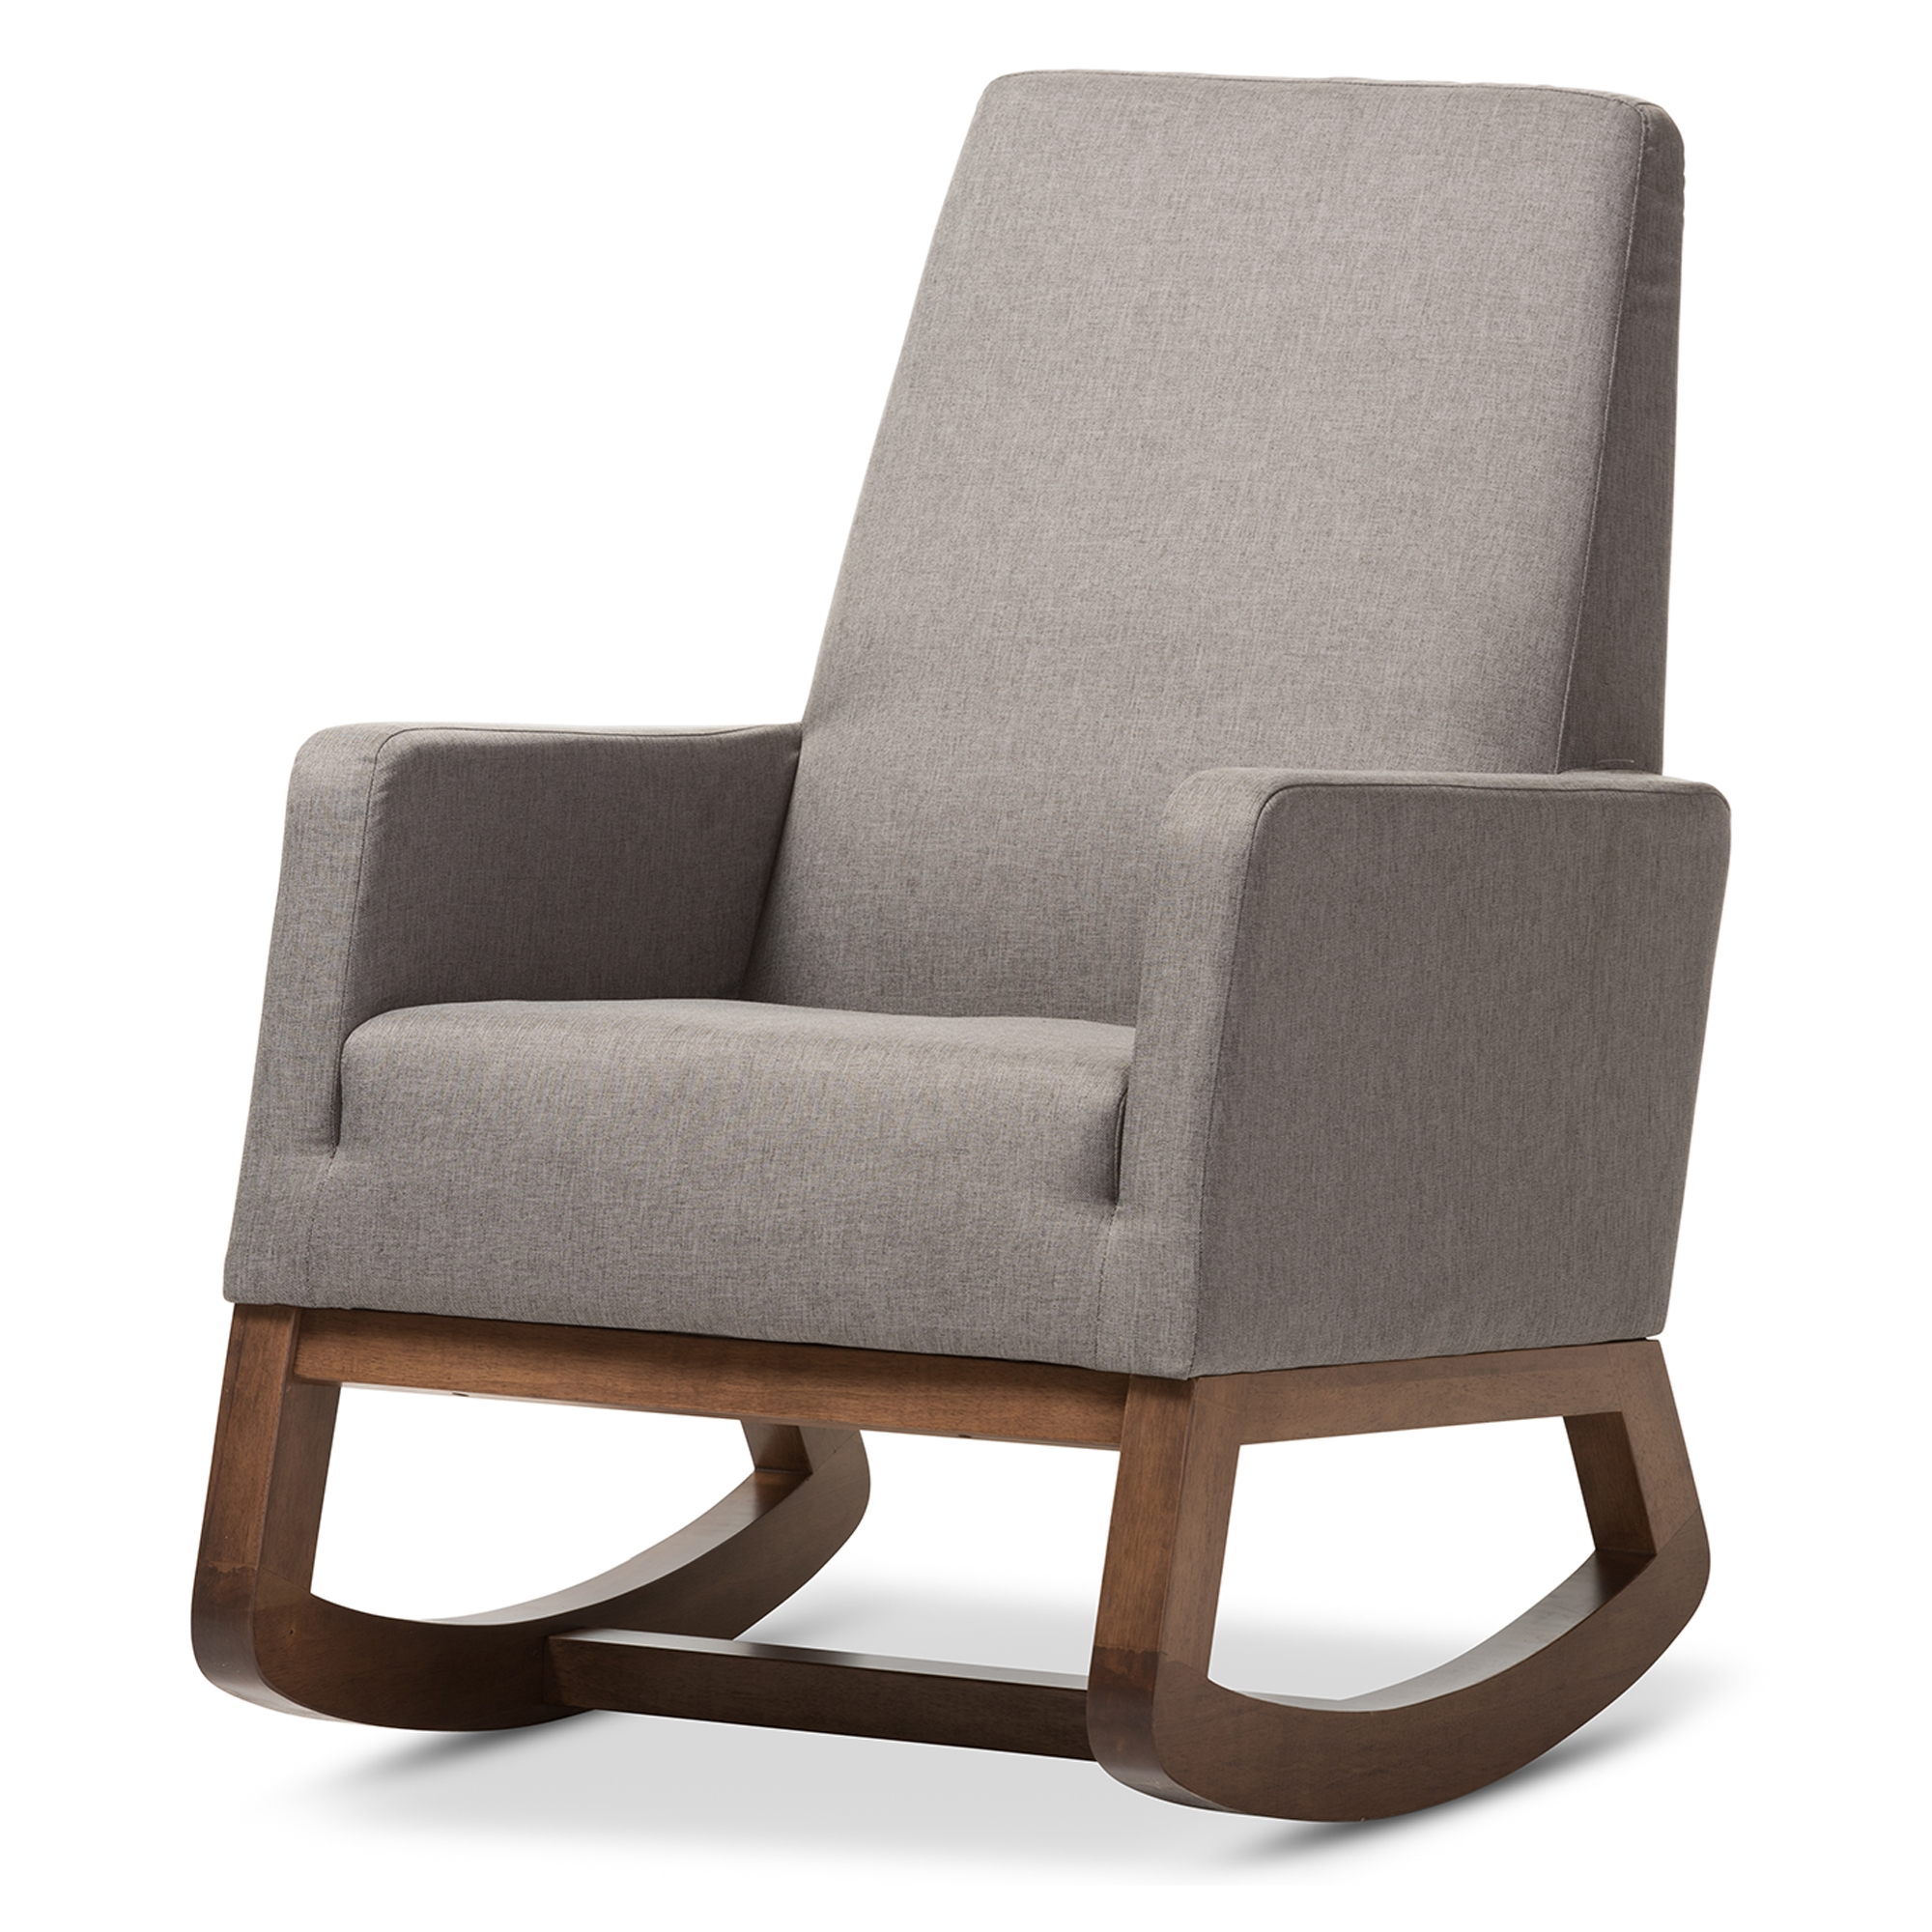 retro modern furniture. Baxton Studio Yashiya Mid-century Retro Modern Grey Fabric Upholstered Rocking Chair - BBT5199- Furniture